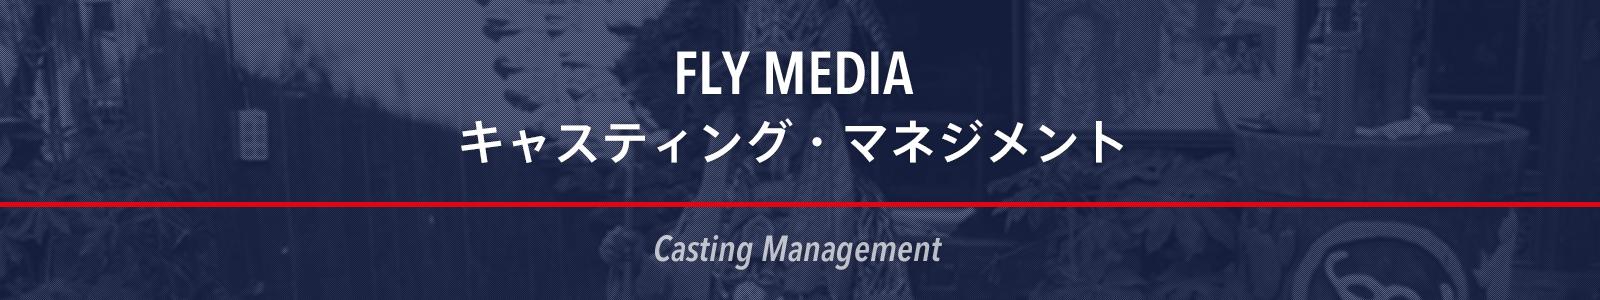 FLY MEDIA キャスティング・マネジメント